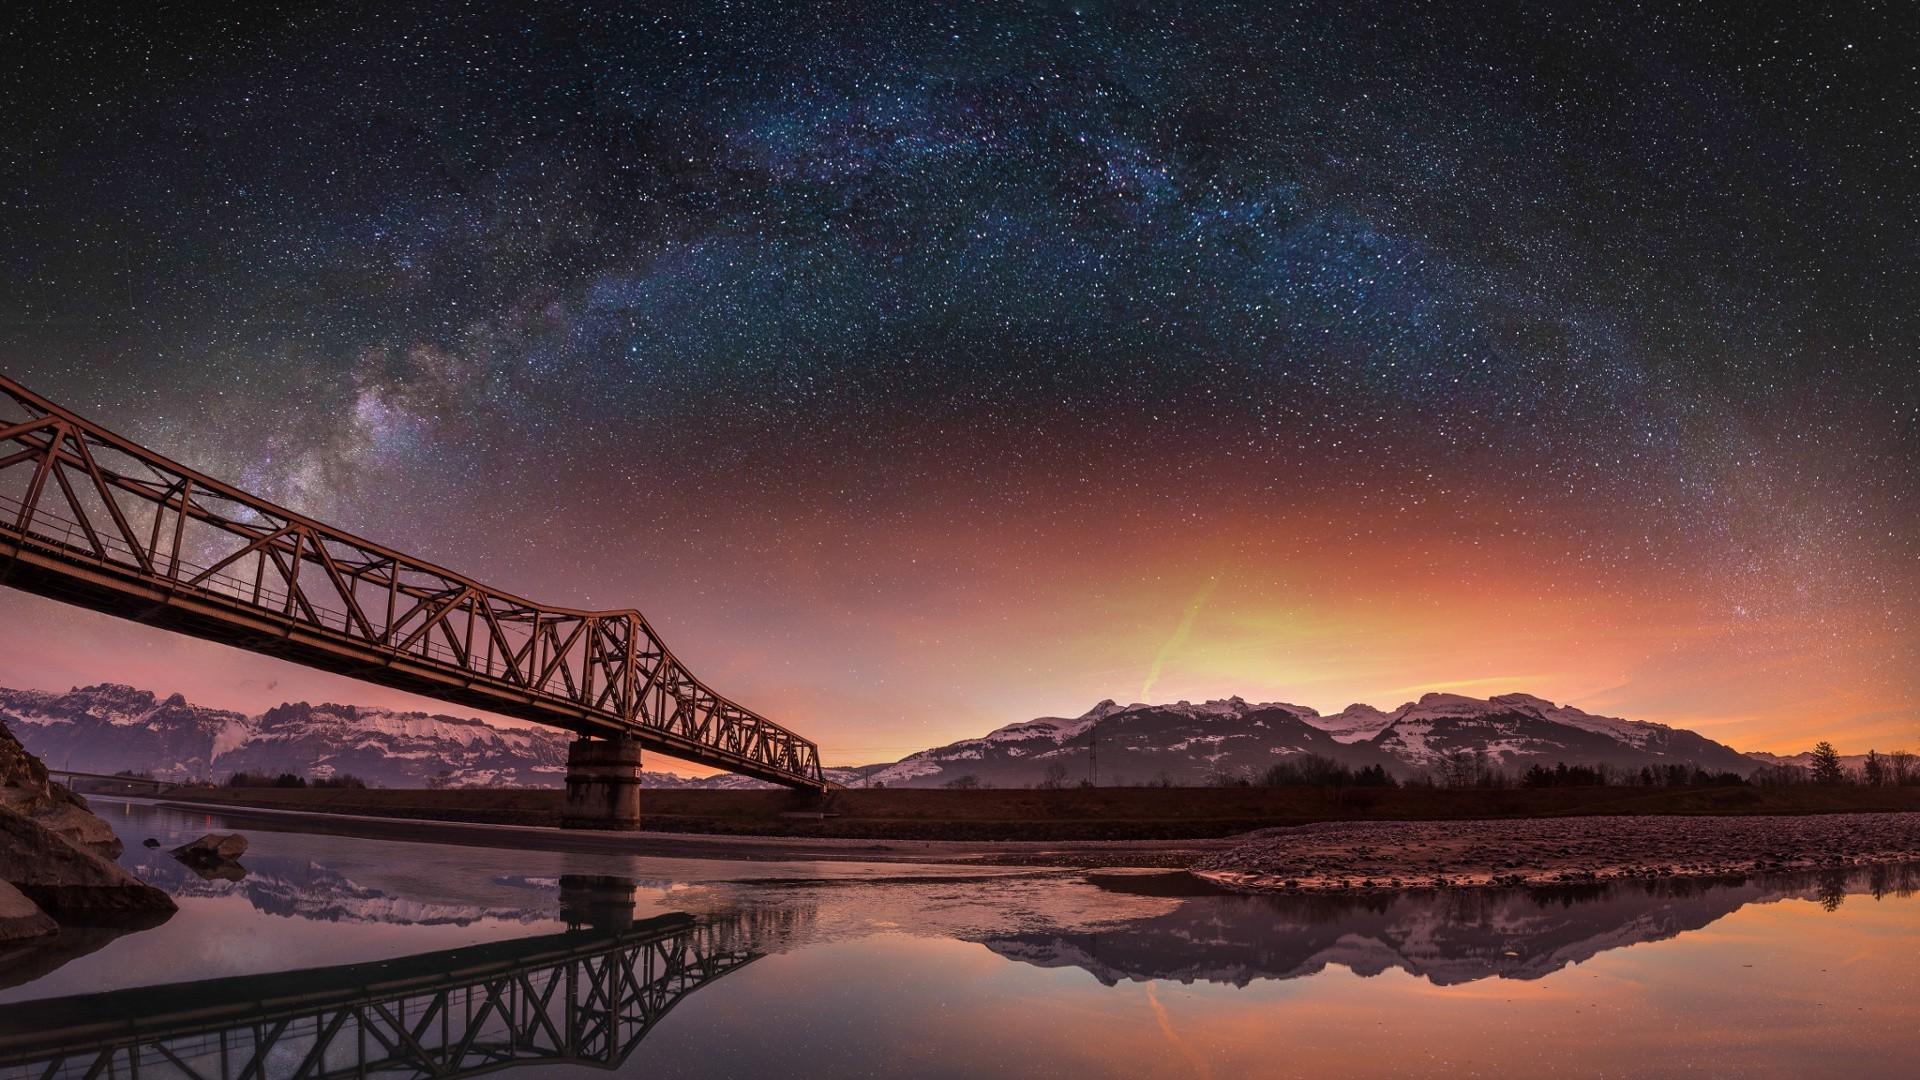 Good Wallpaper Night Evening - night-galaxy-lake-reflection-sky-stars-evening-Milky-Way-bridge-atmosphere-Switzerland-dusk-Aurora-dawn-star-1920x1080-px-astronomical-object-596947  Gallery-372774.jpg